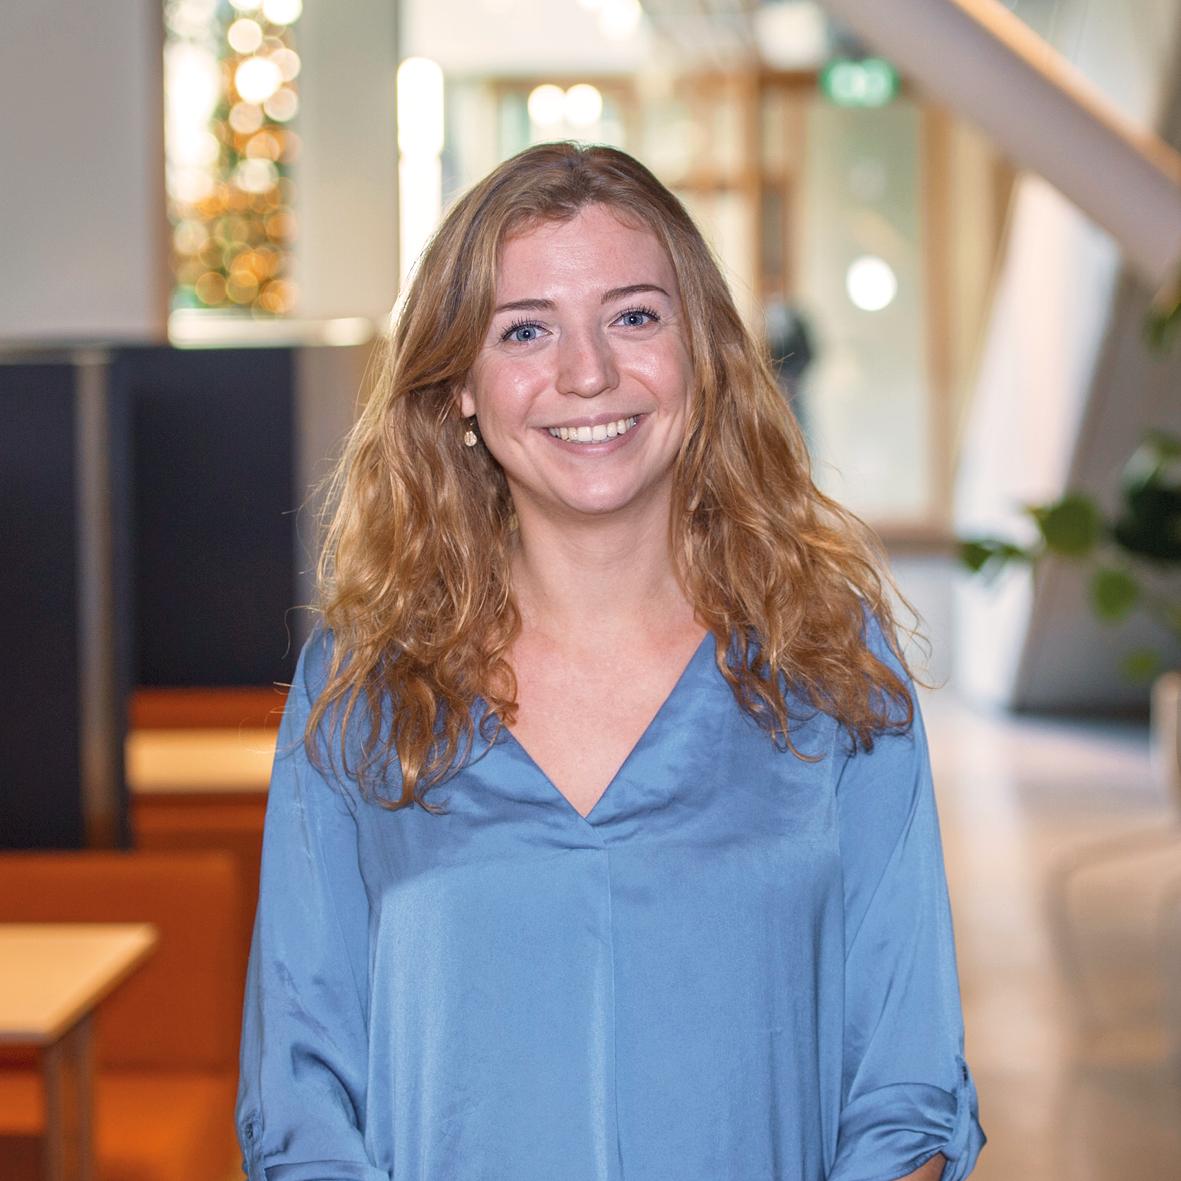 Charlotte Moerkerken projectcoördinator